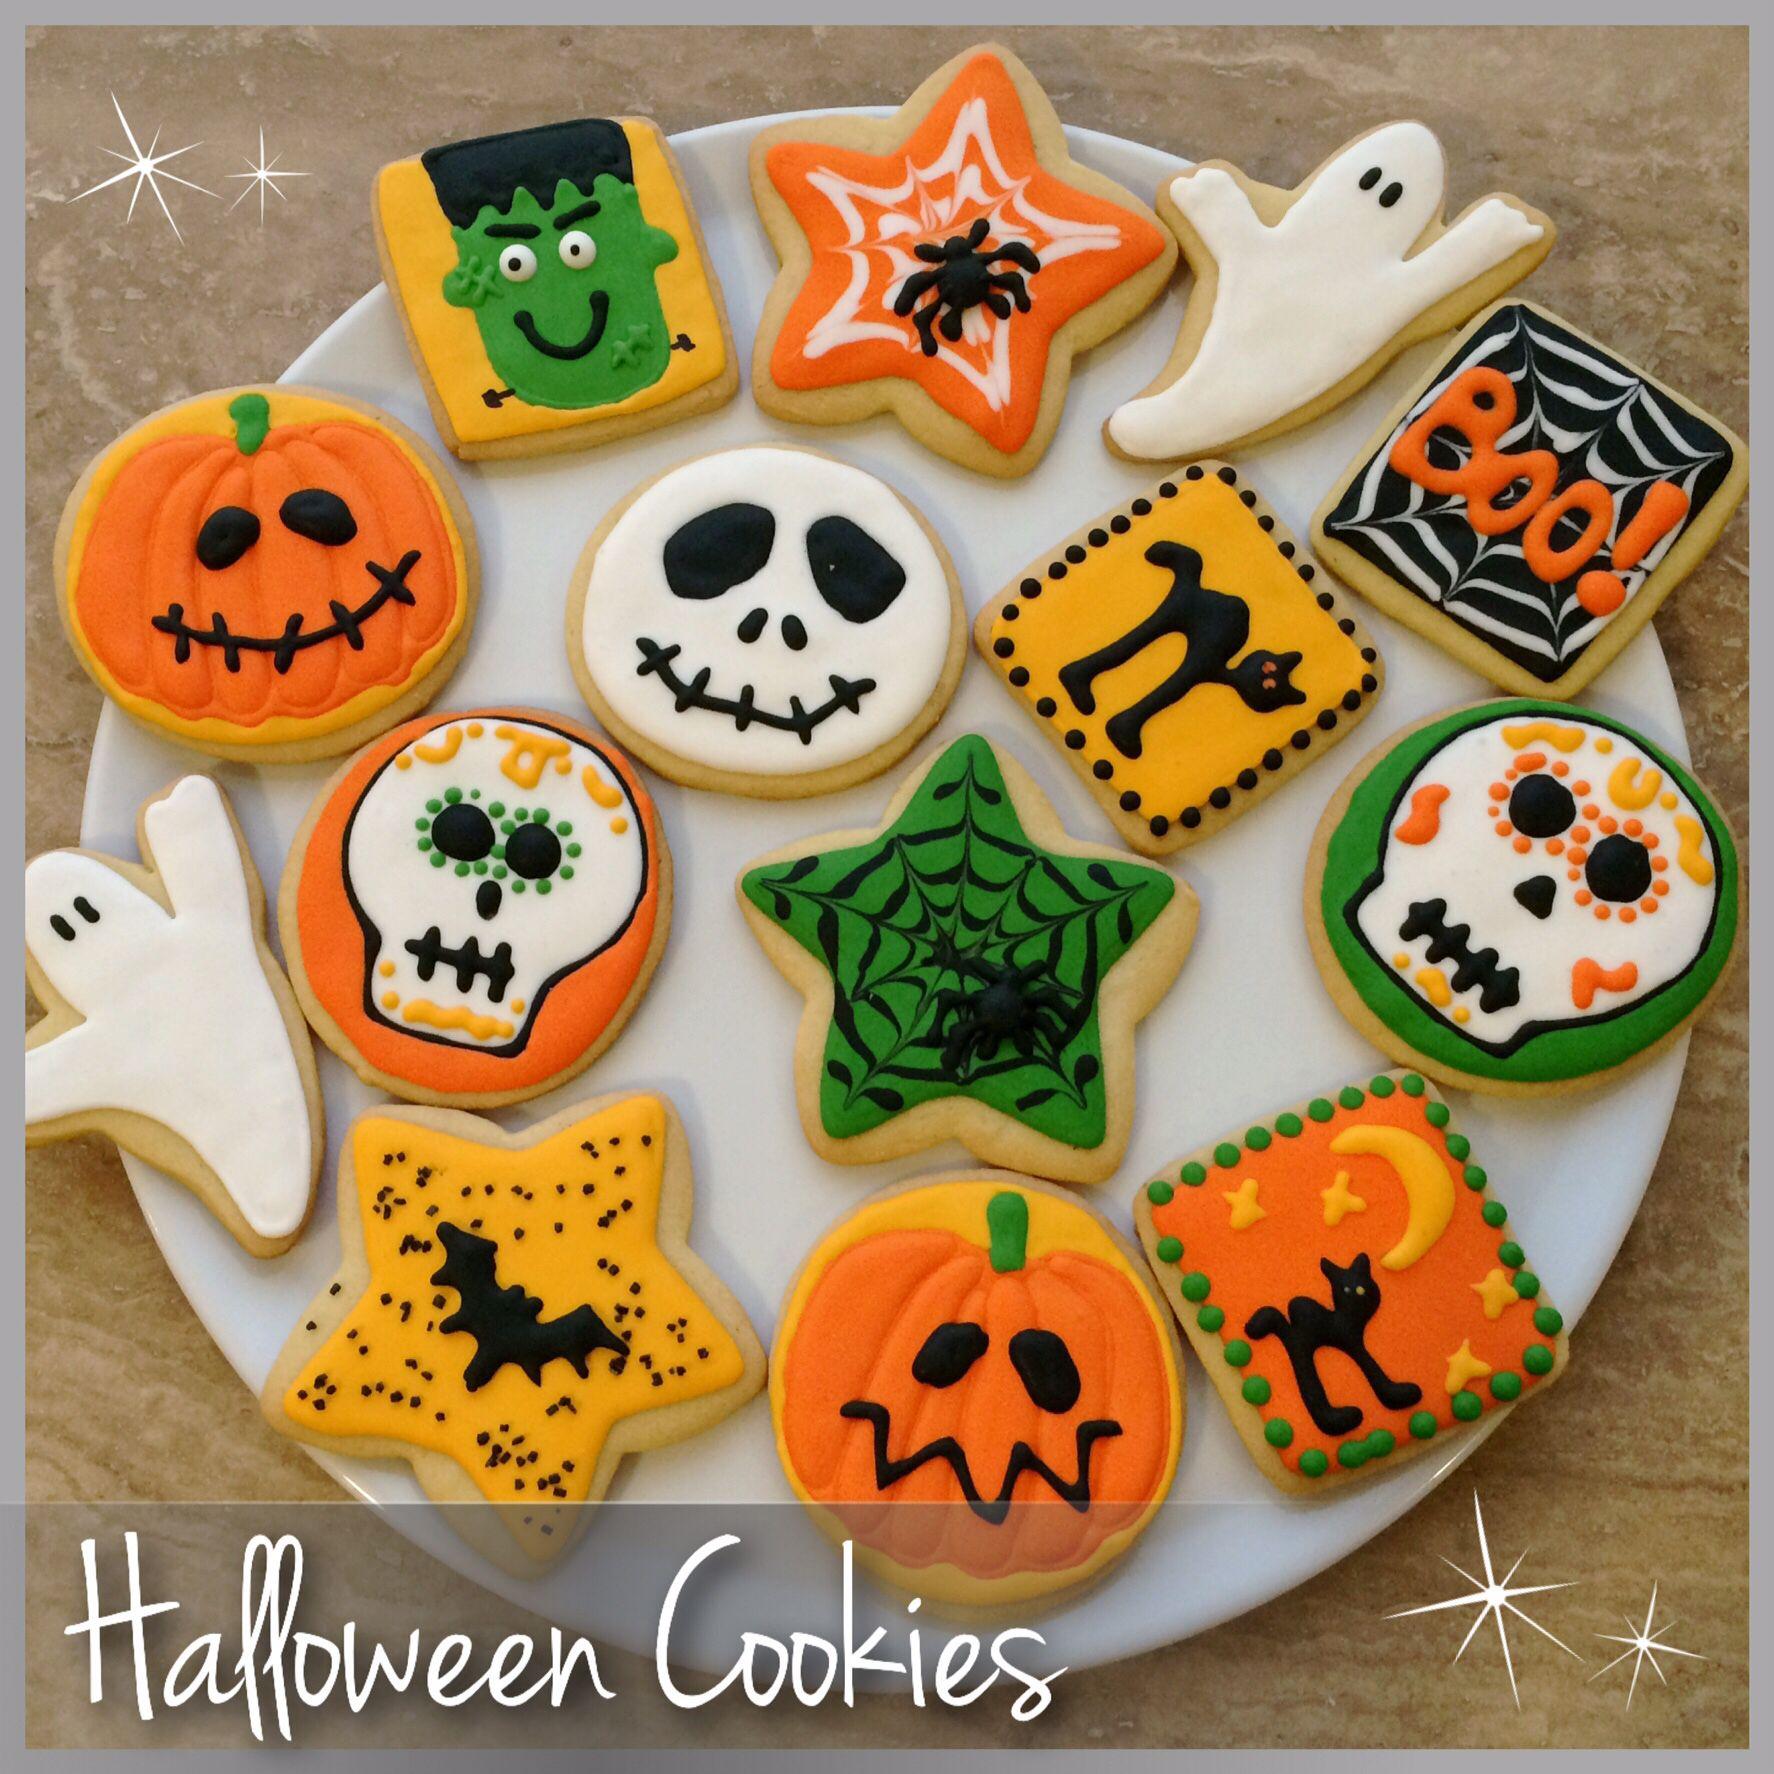 Royal icing halloween cookies!